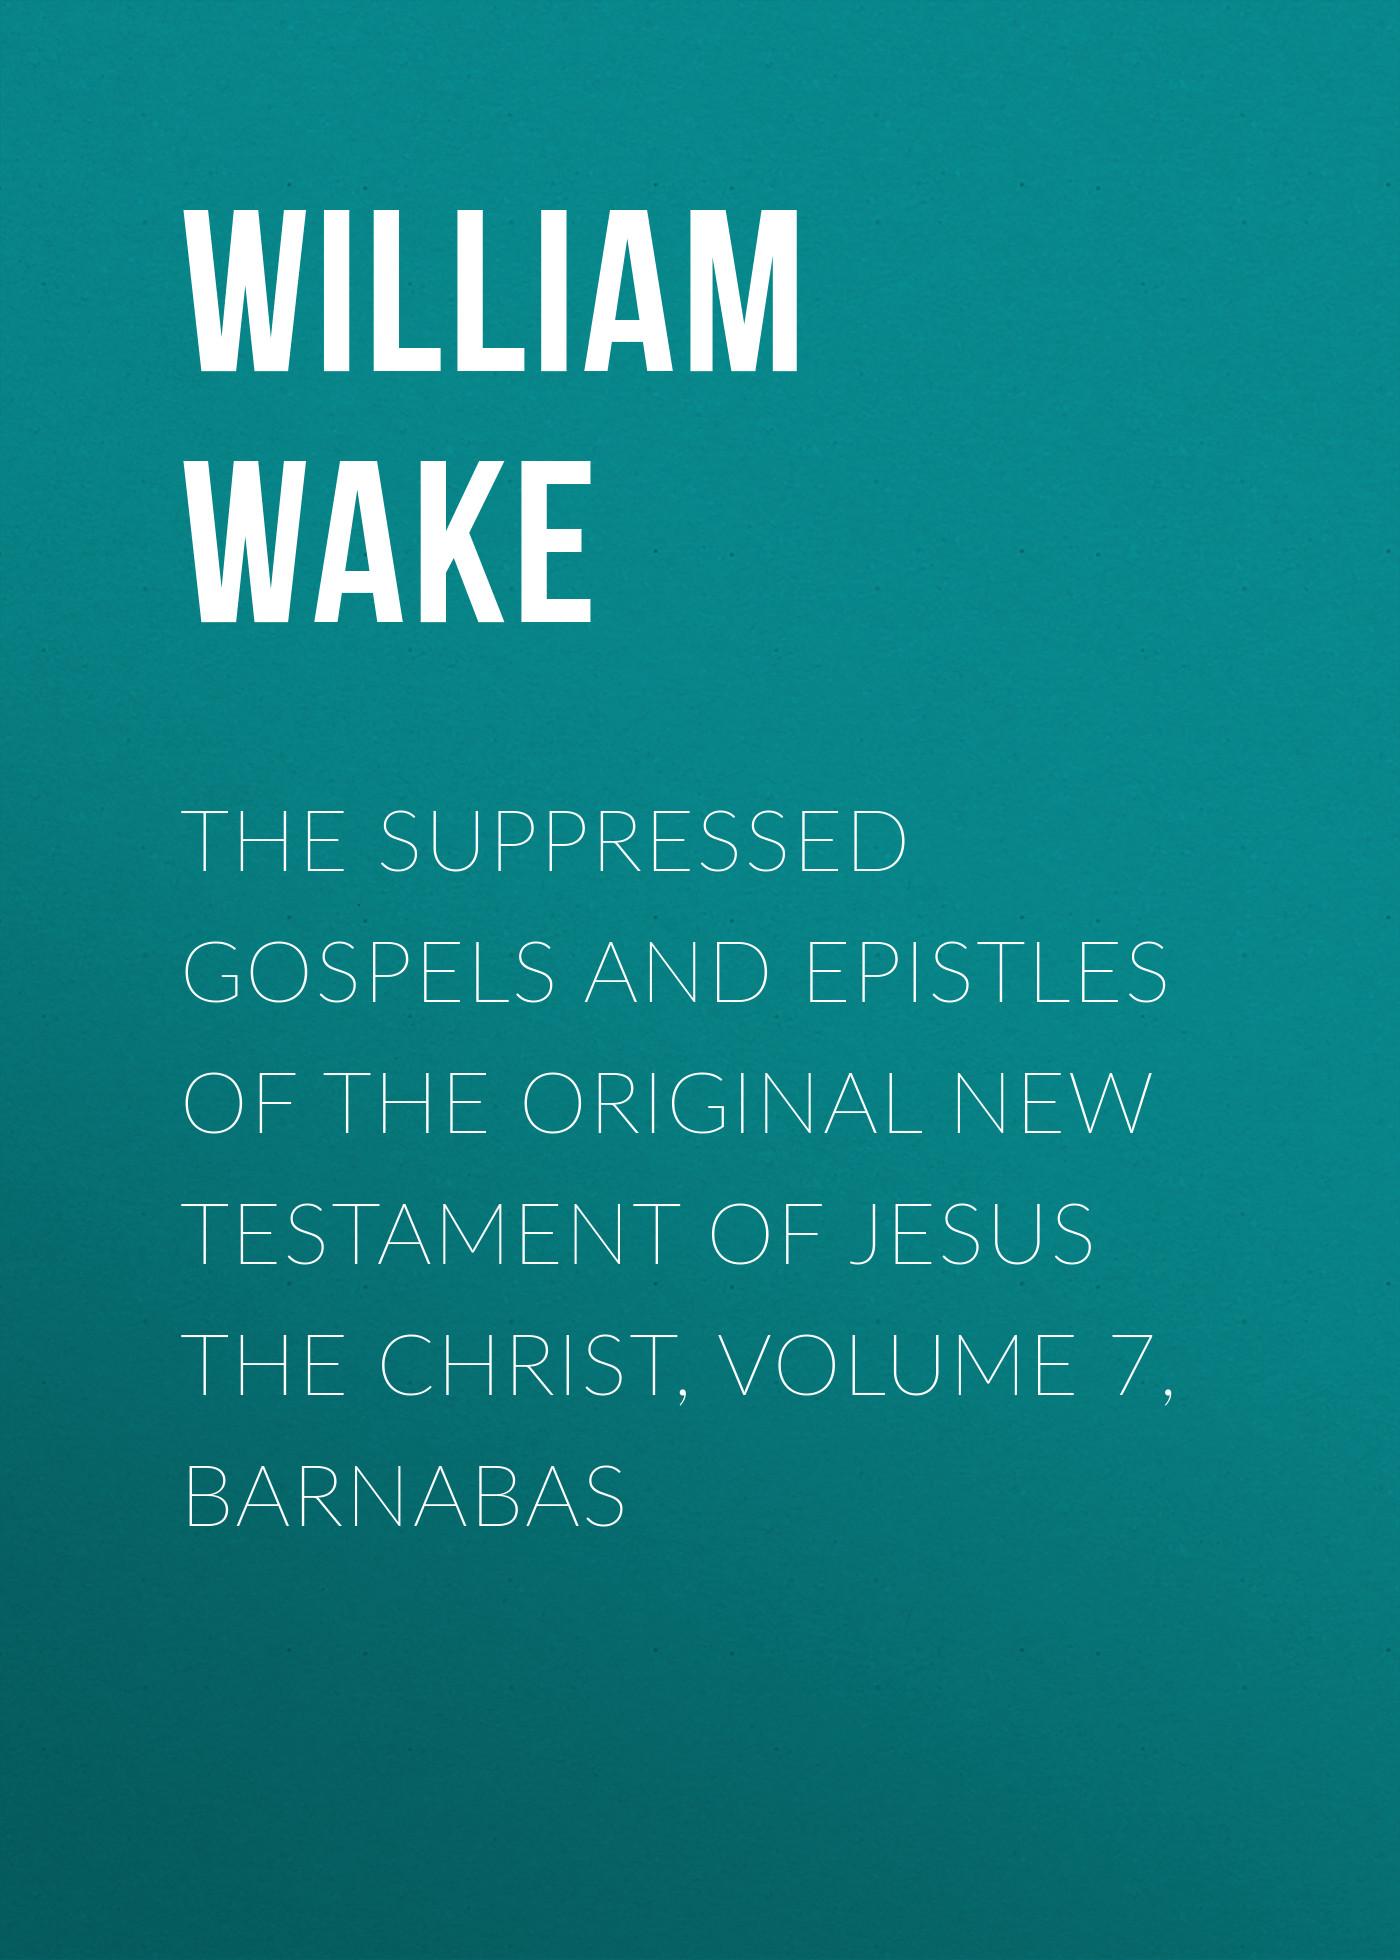 William Wake The suppressed Gospels and Epistles of the original New Testament of Jesus the Christ, Volume 7, Barnabas стоимость